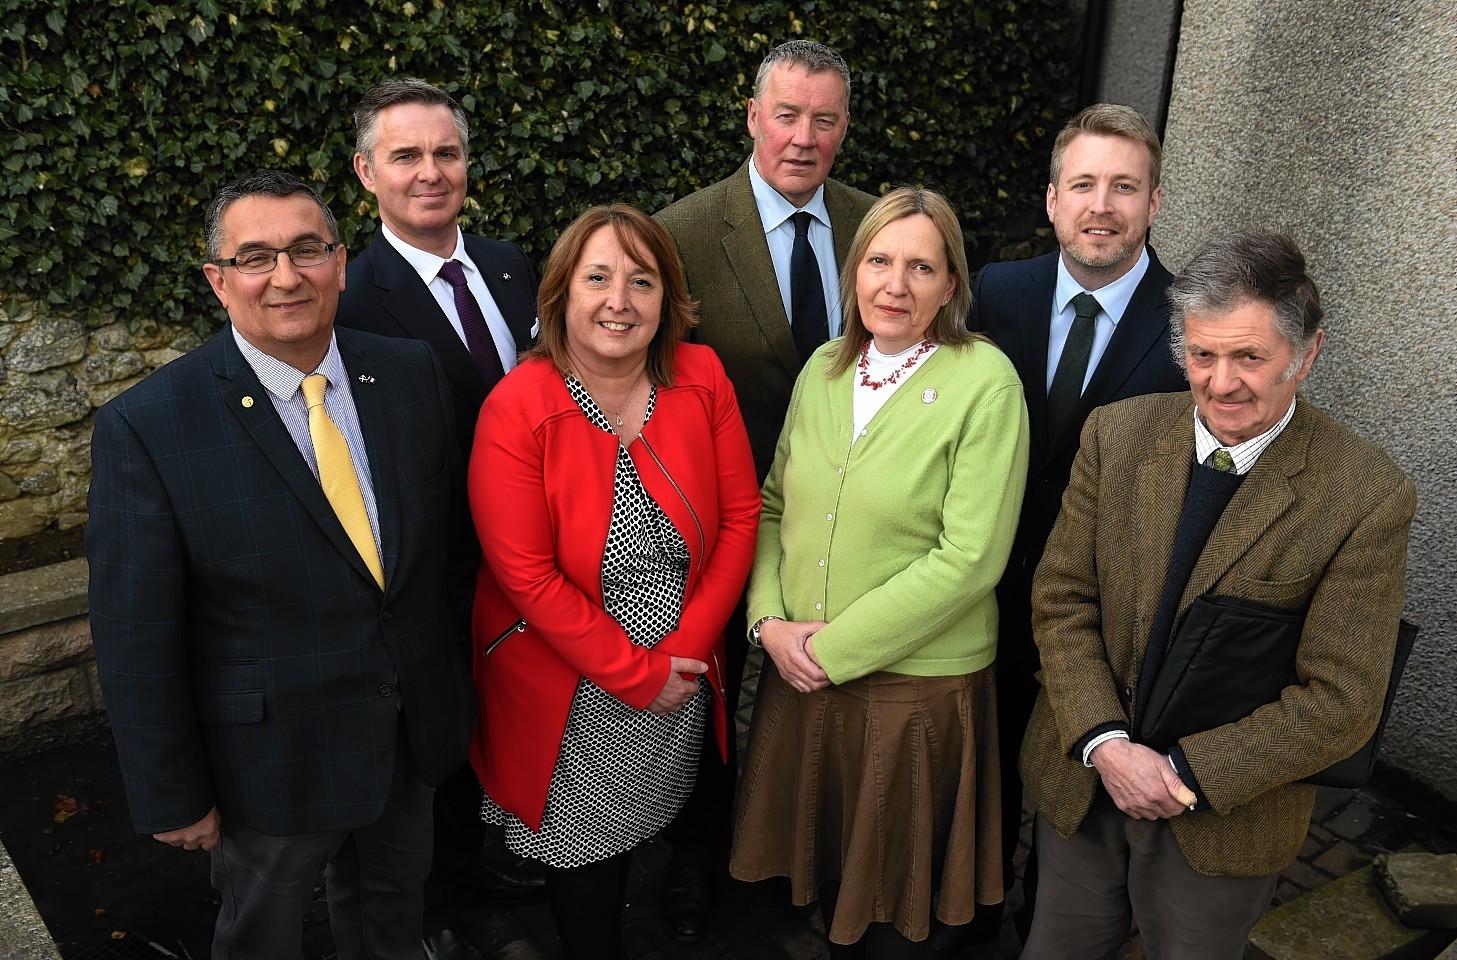 Christian Allard, Colin Clark, Christine Jardine, NFUS vice president Andrew McCornick, Sarah Flavell, Dan Yeats and Philip Anderson